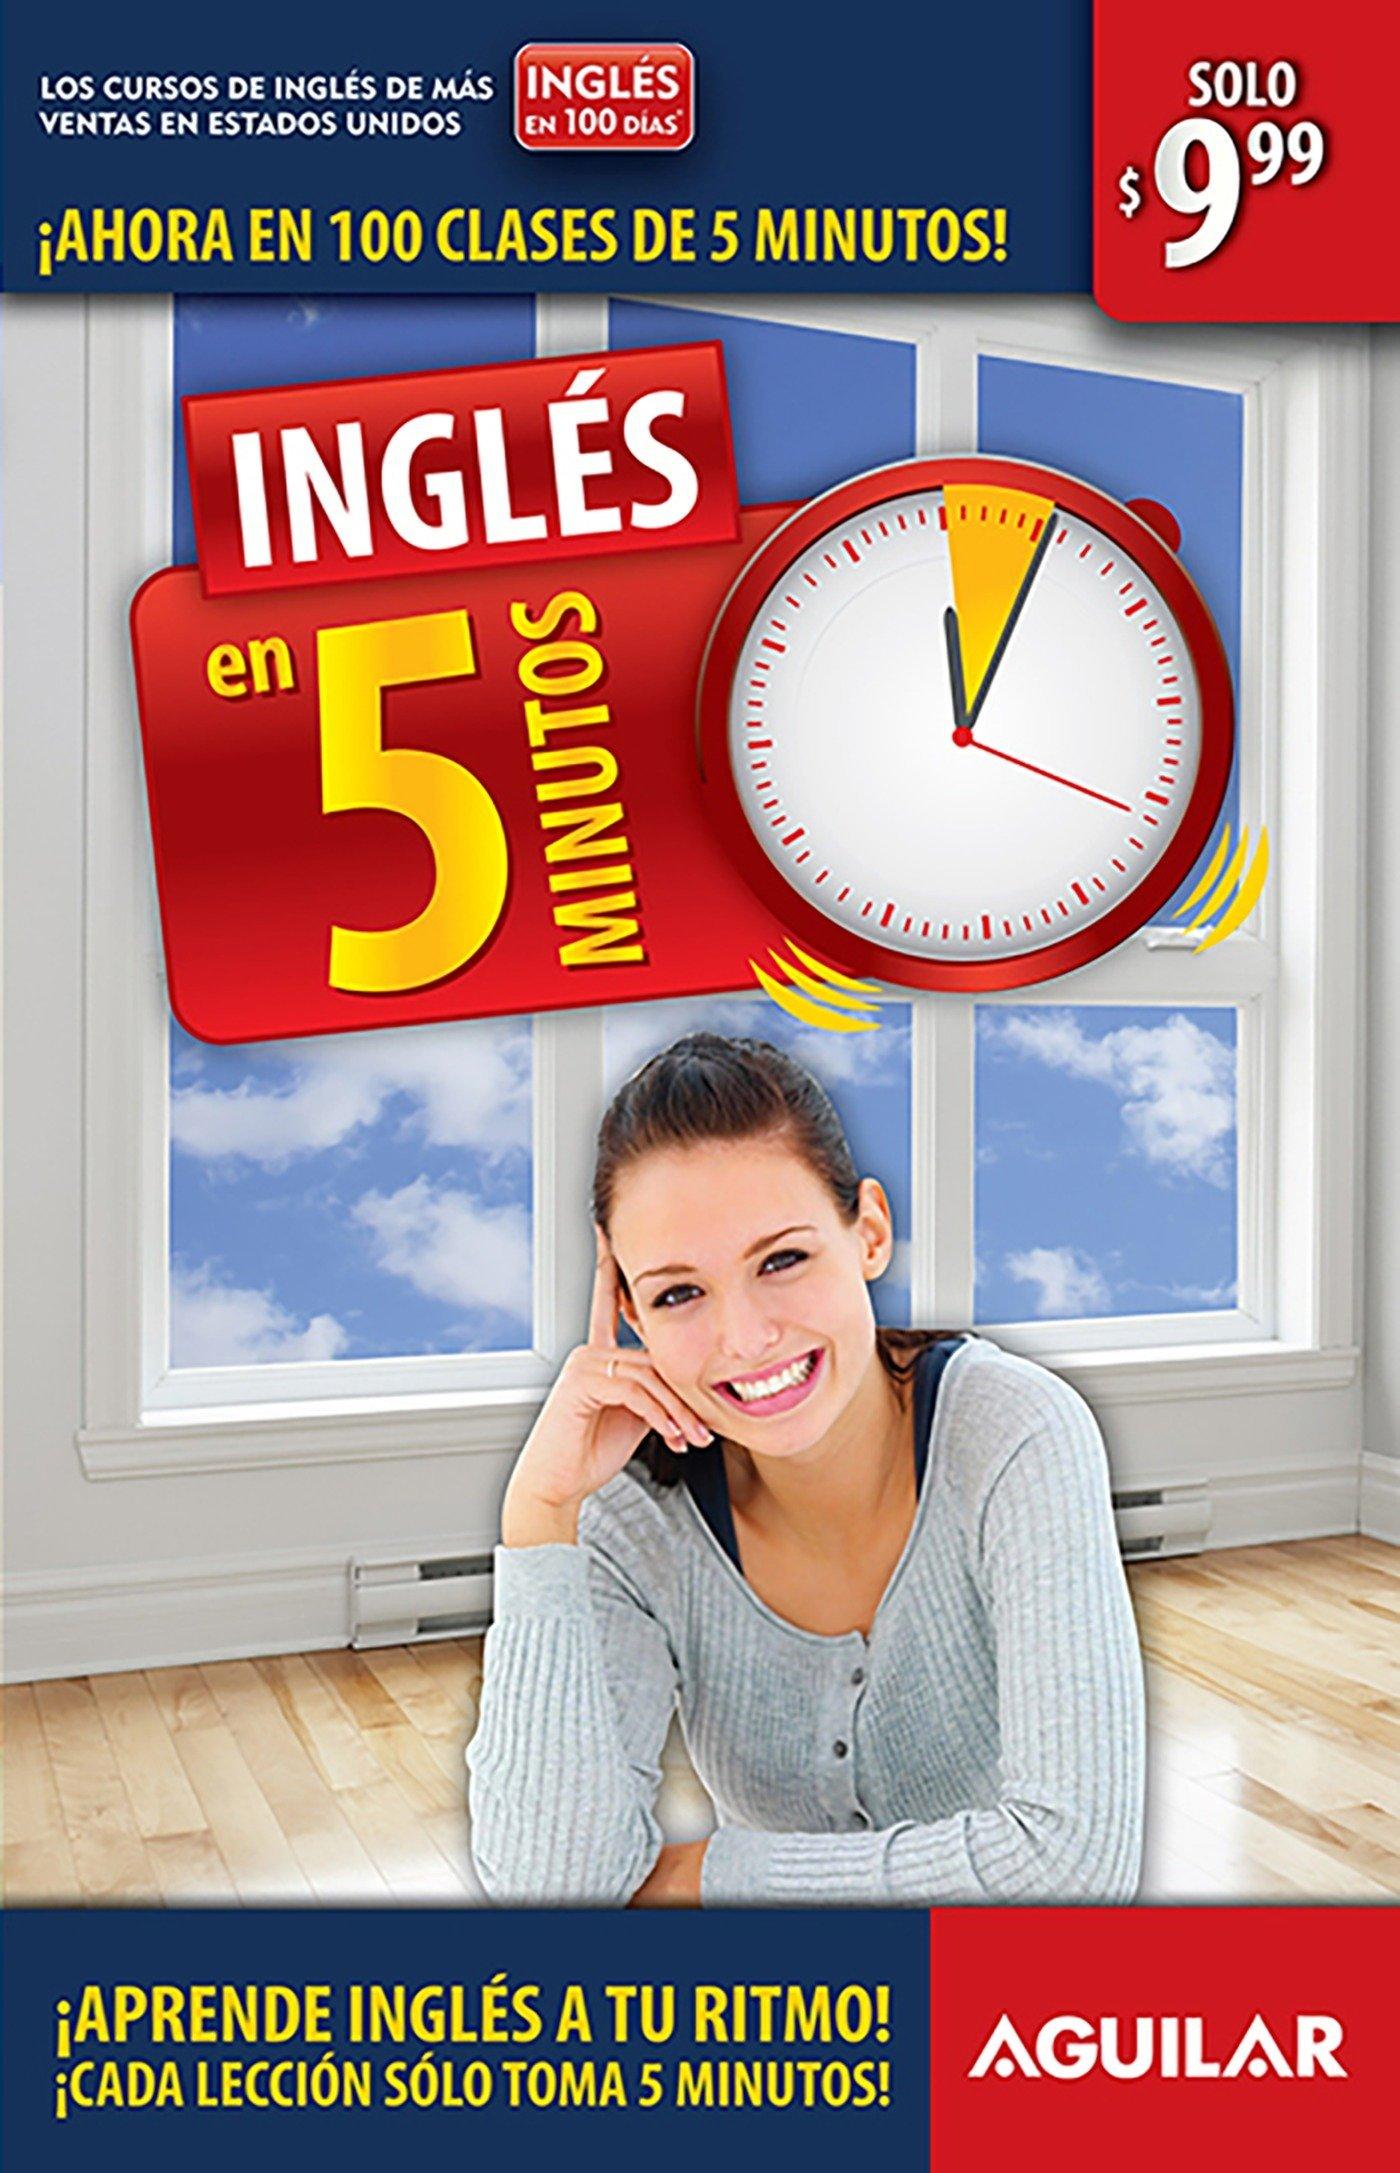 Inglés en 100 días - Inglés en 5 minutos / English in 100 Days - English in 5 Minutes (Spanish Edition) PDF